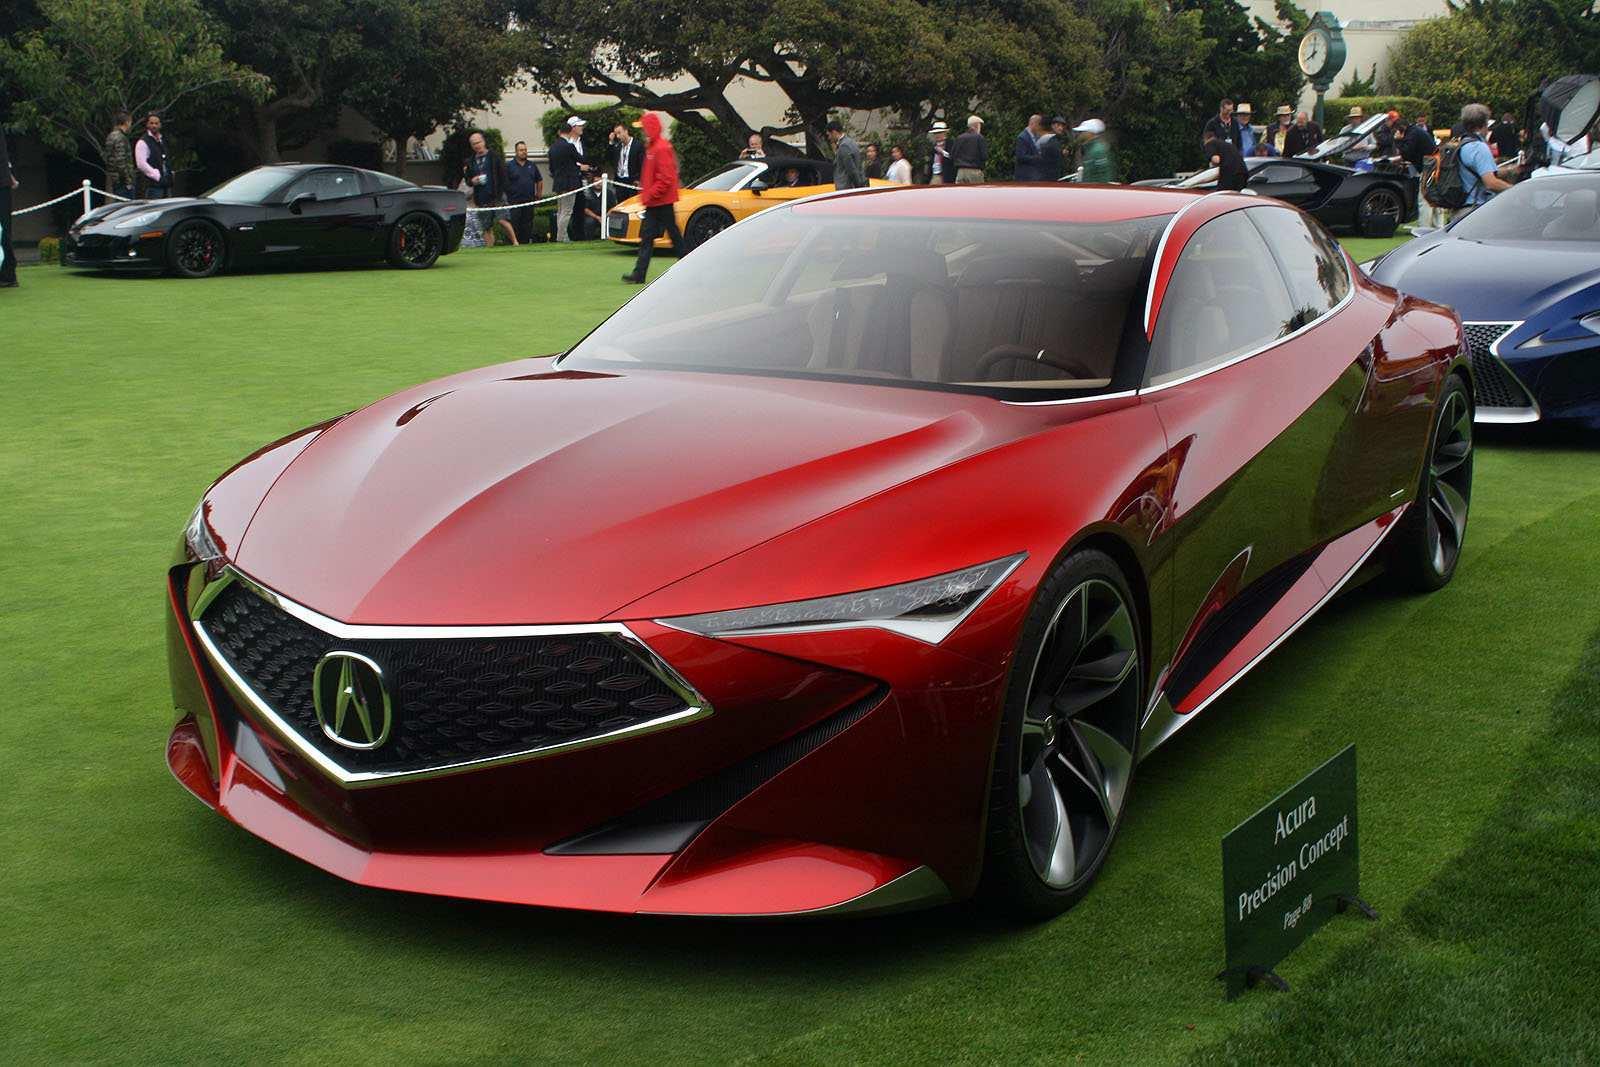 36 Concept of 2020 Acura Pebble Beach Interior with 2020 Acura Pebble Beach